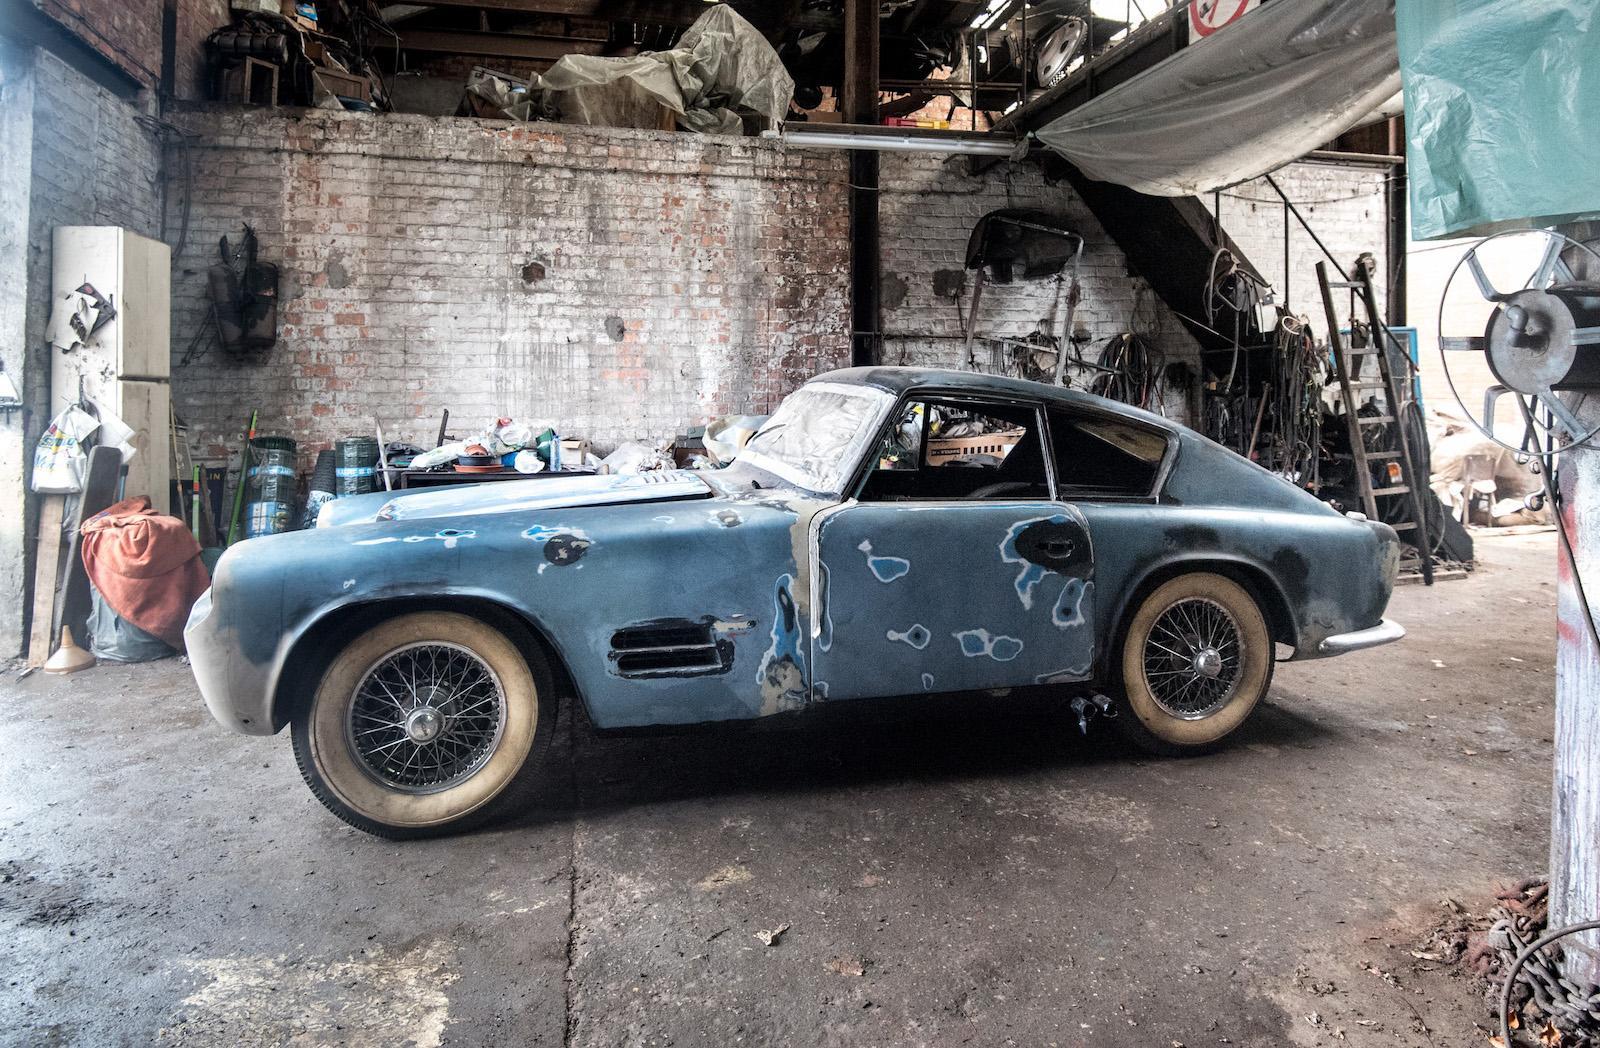 autoclassics for jaguar and rare belgian com ferrari belgium news more michelotti amazing posts barnfind sale